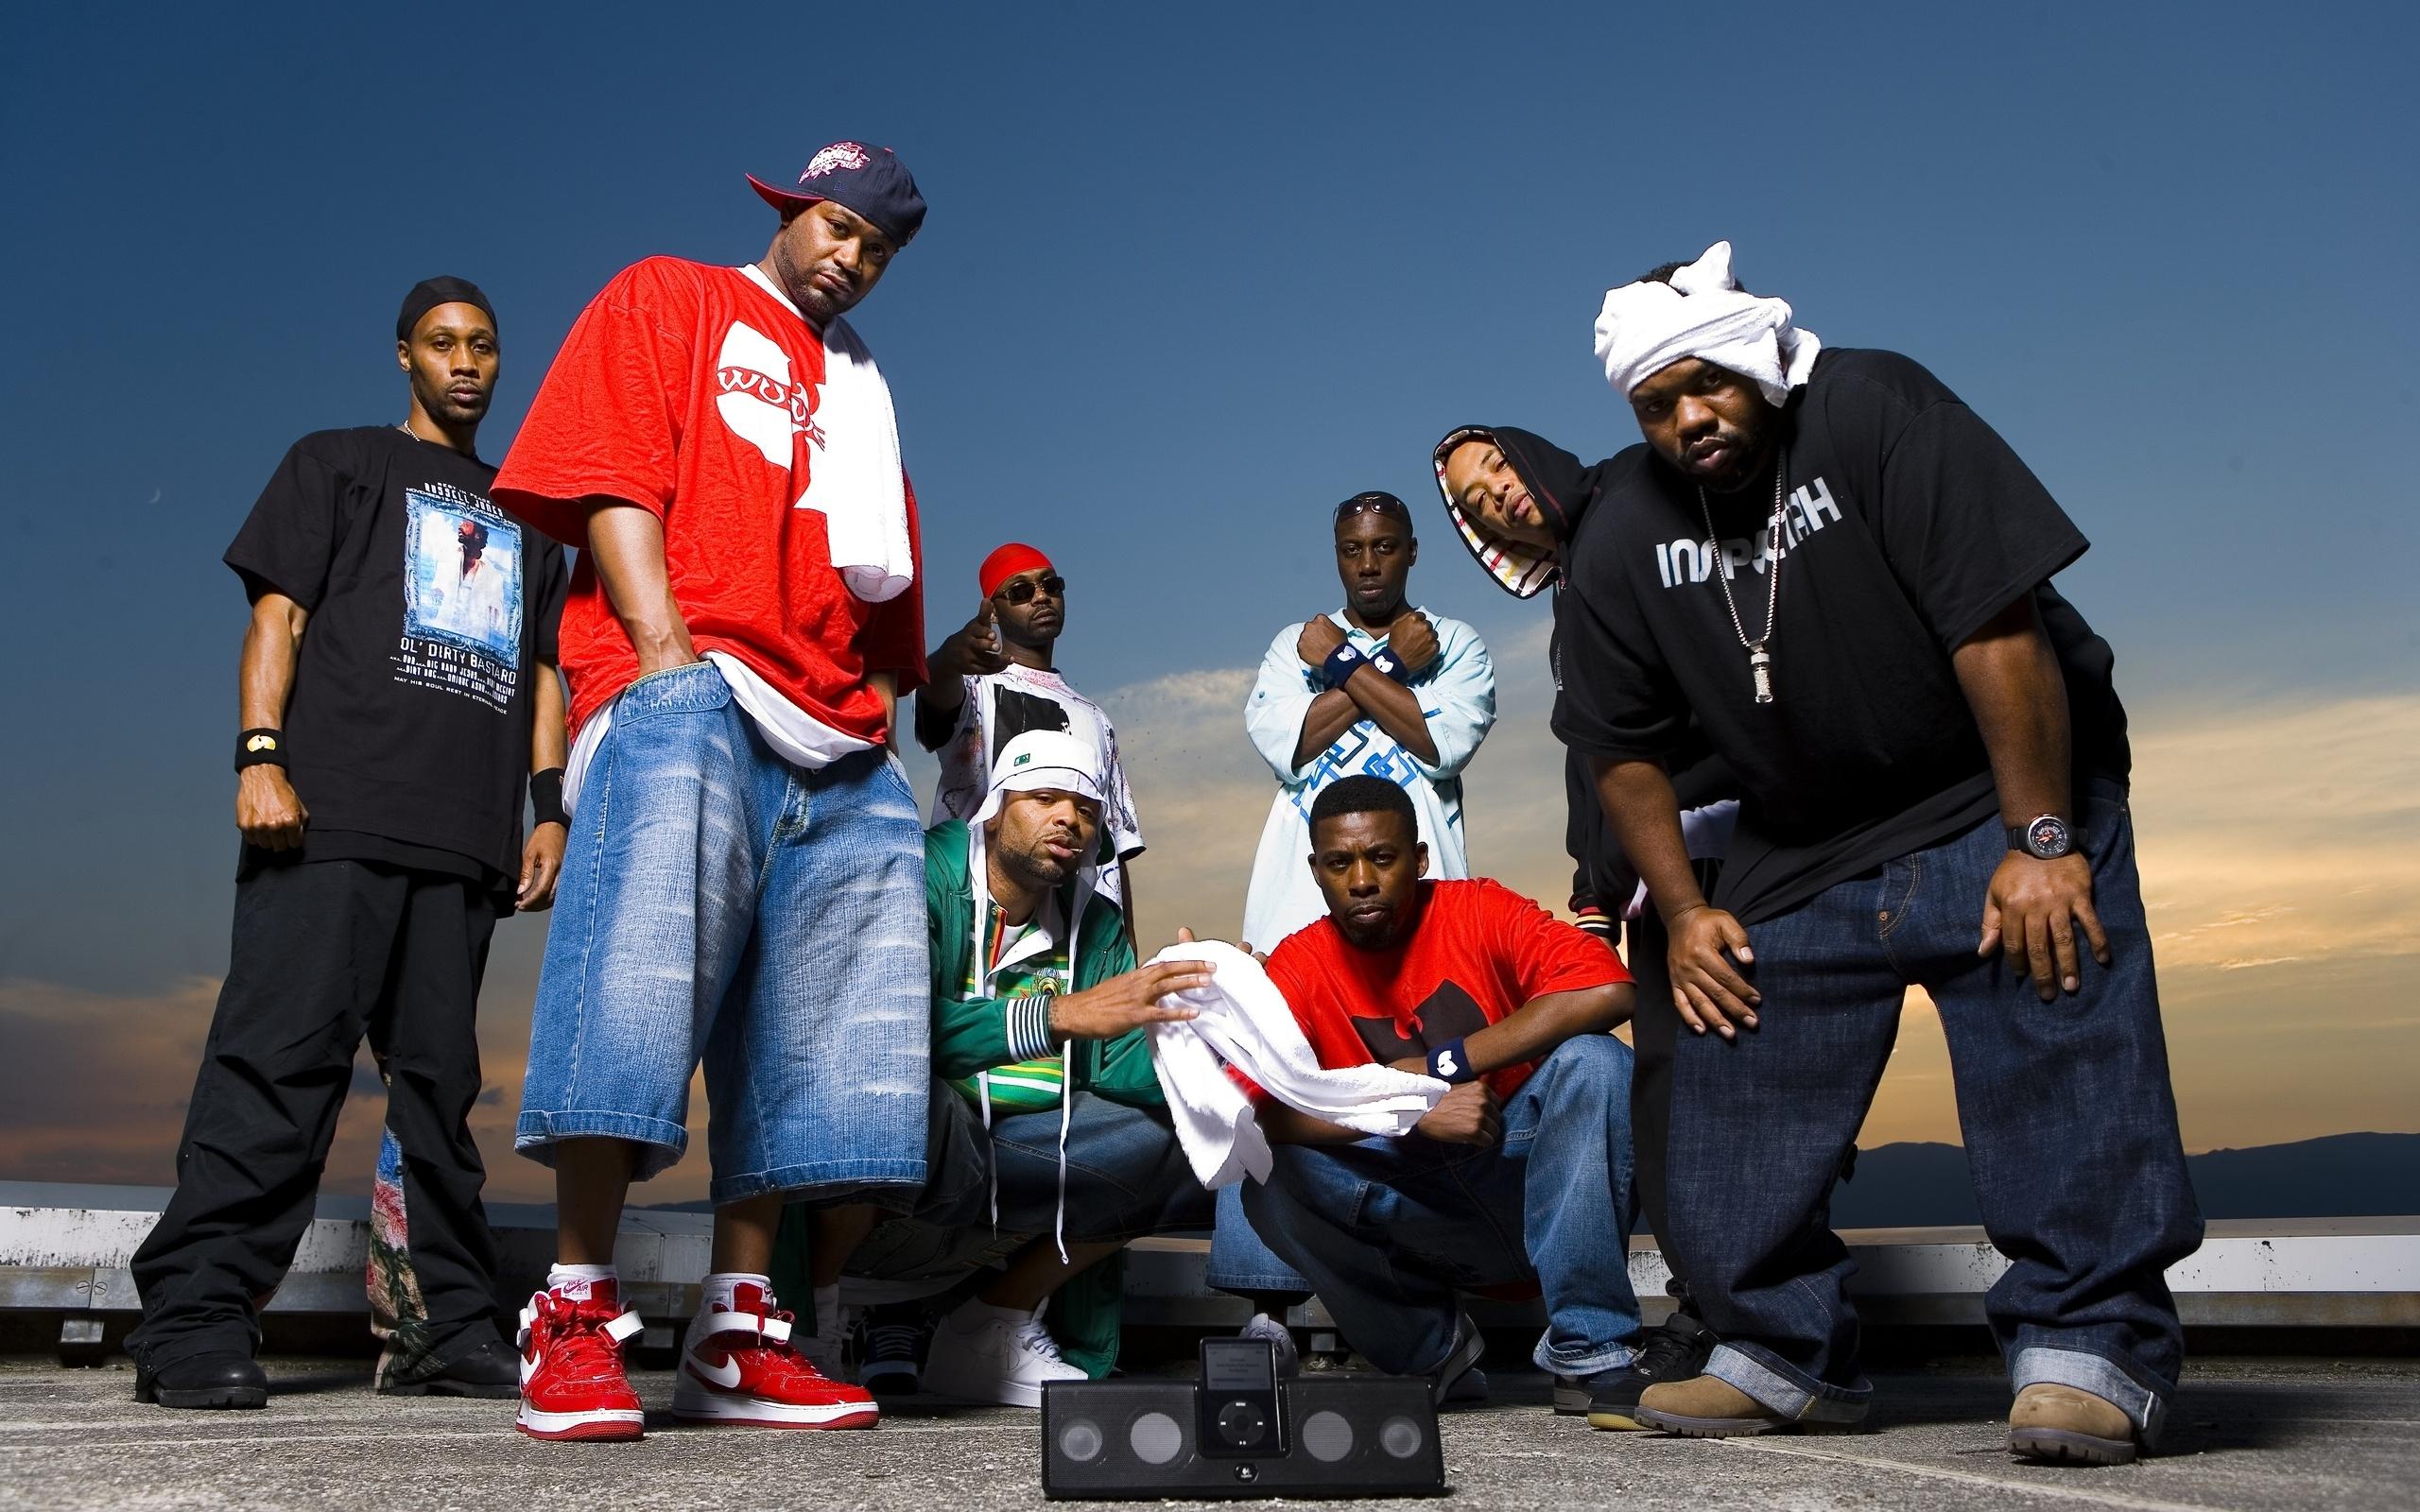 Zastaki.com - Wu-Tang Clan